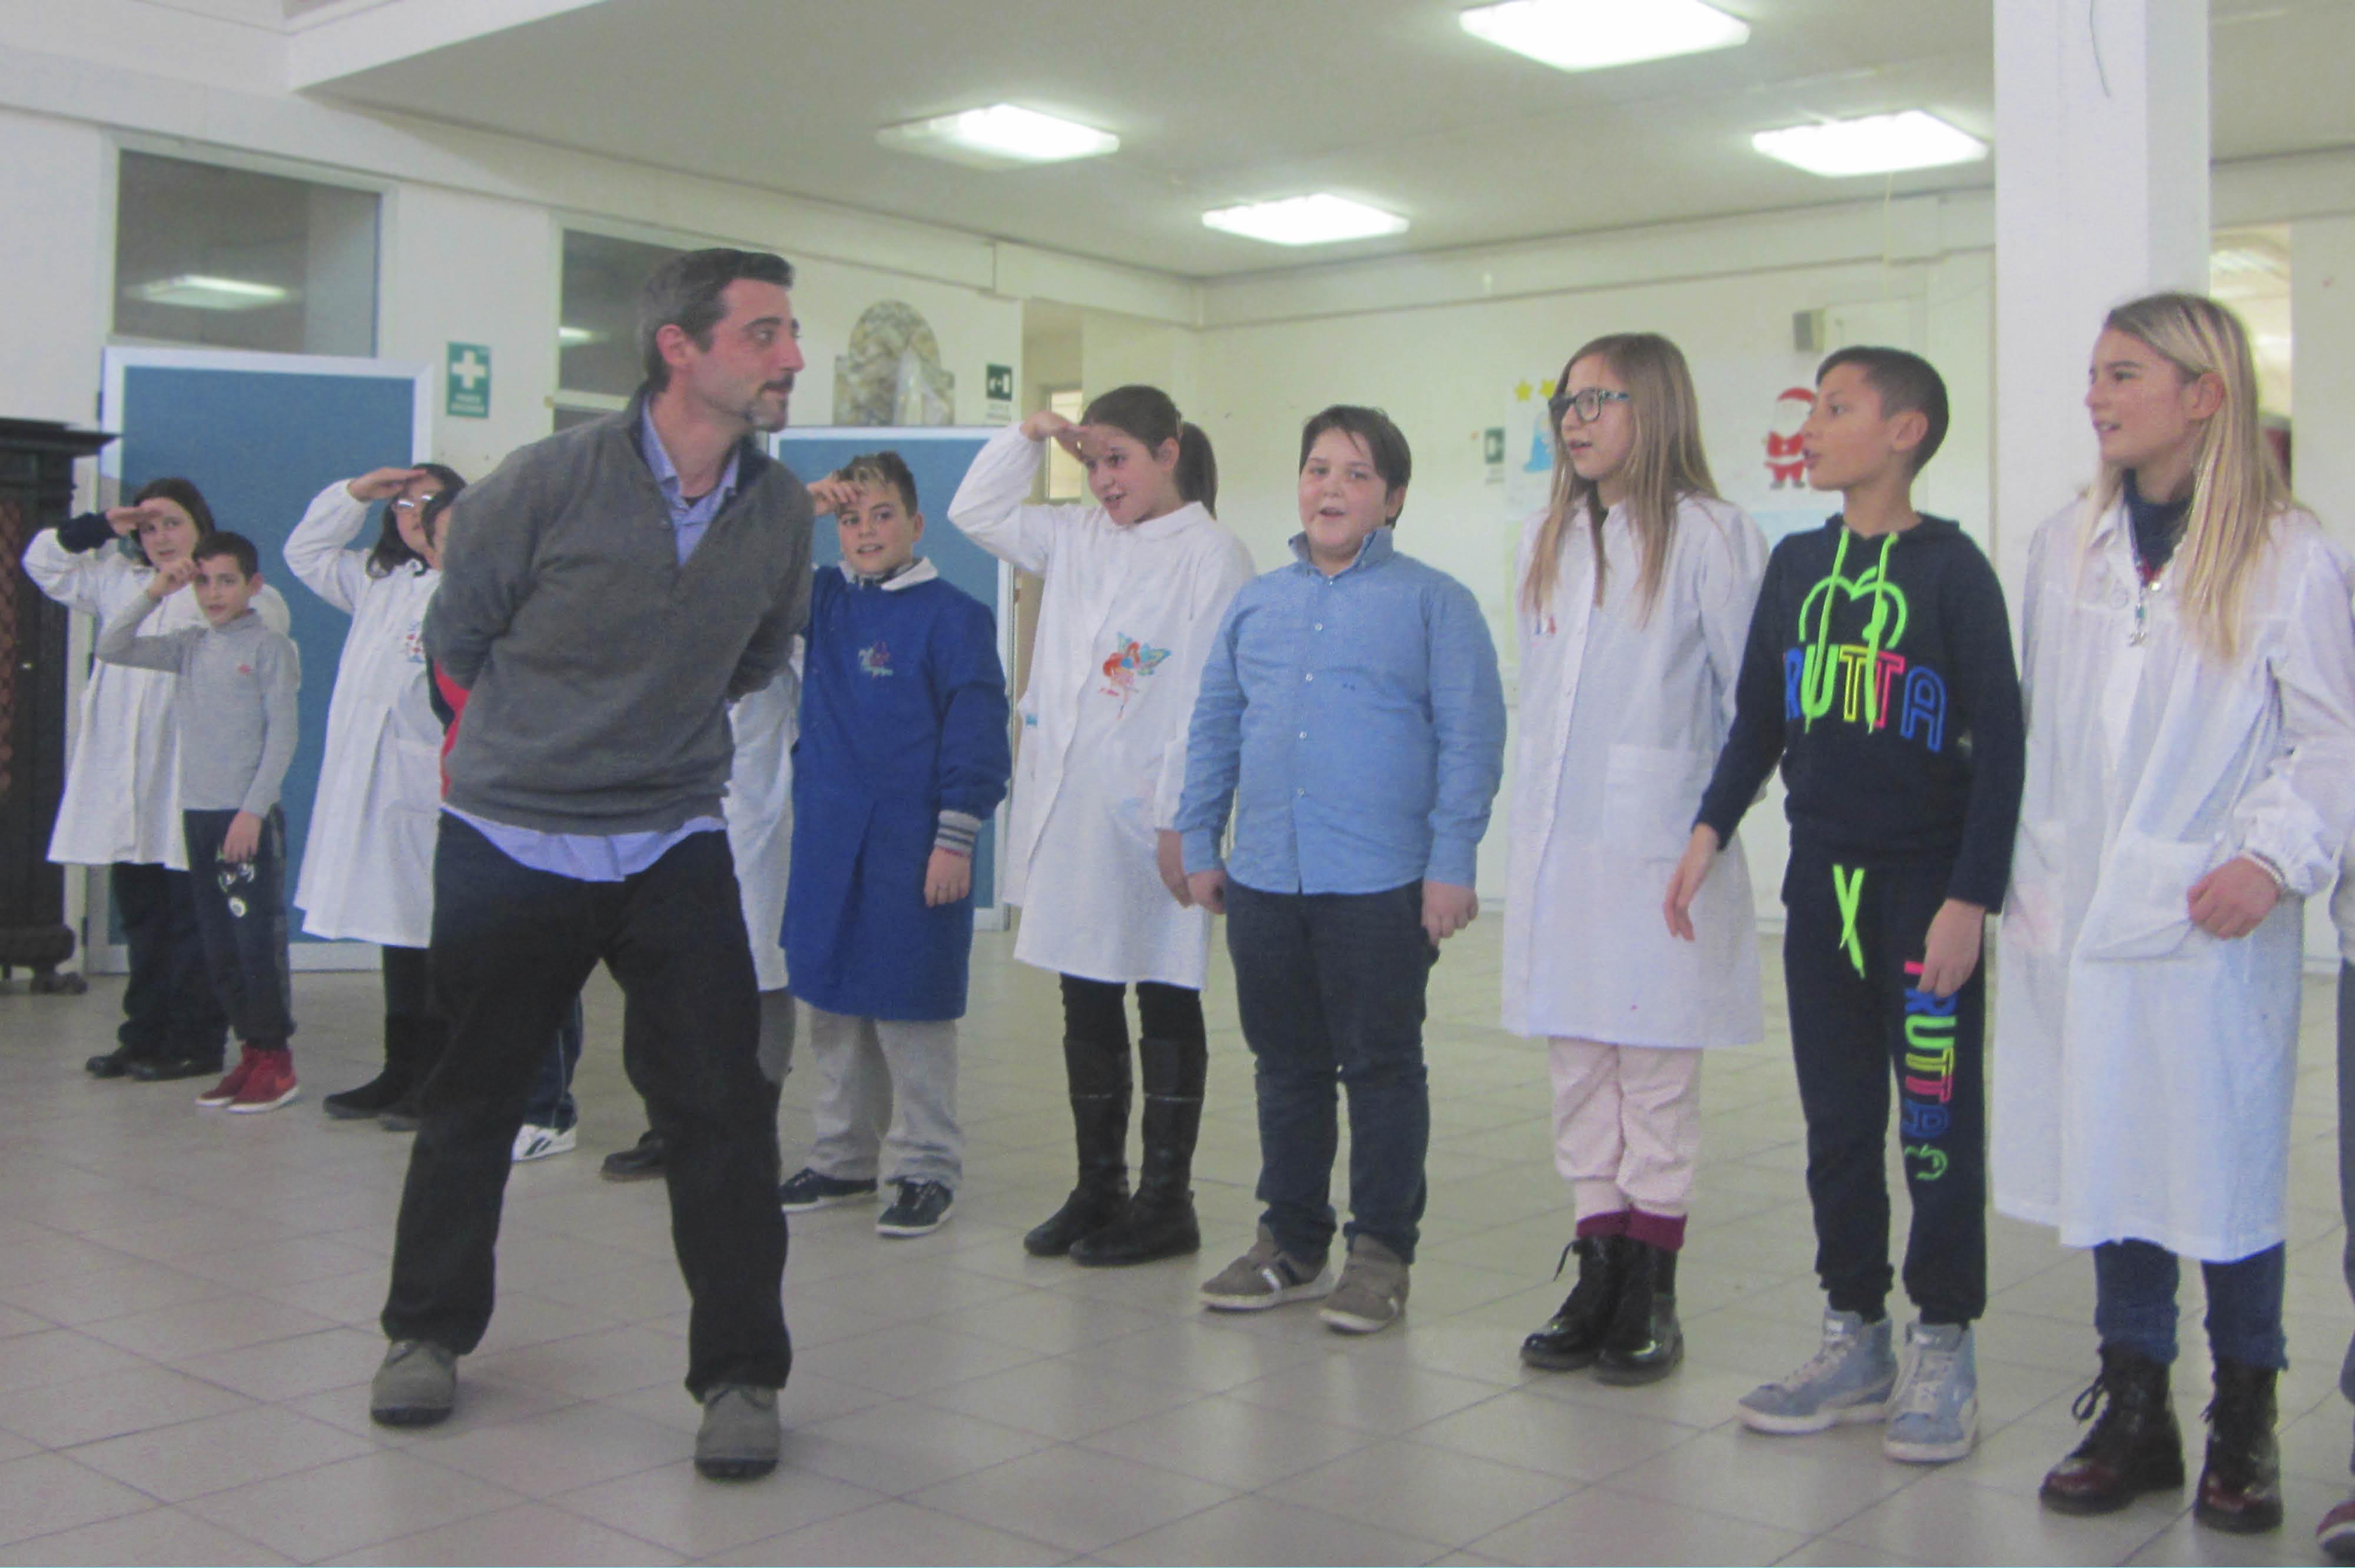 Benedict School Pomigliano d'Arco @ Somma28